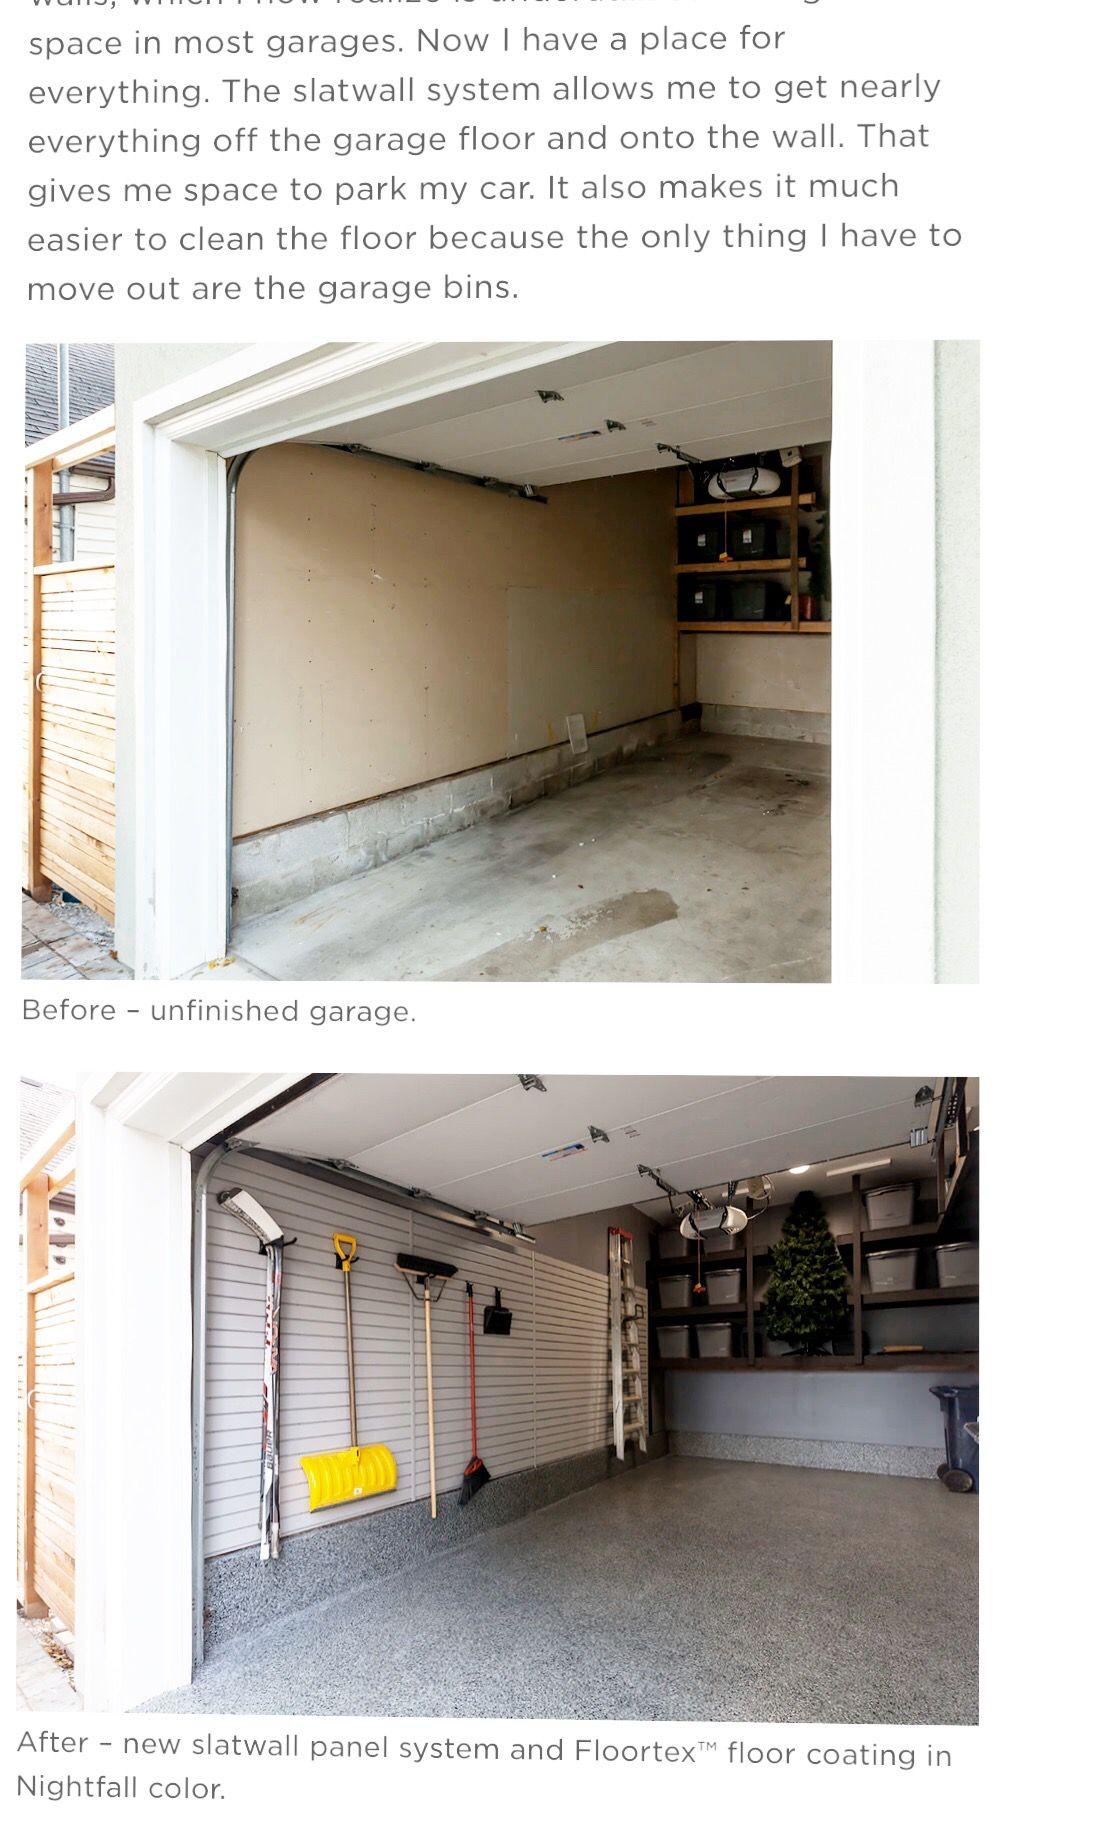 Pin by Kim Adamo on Moving Slat wall, Flooring, Garage floor